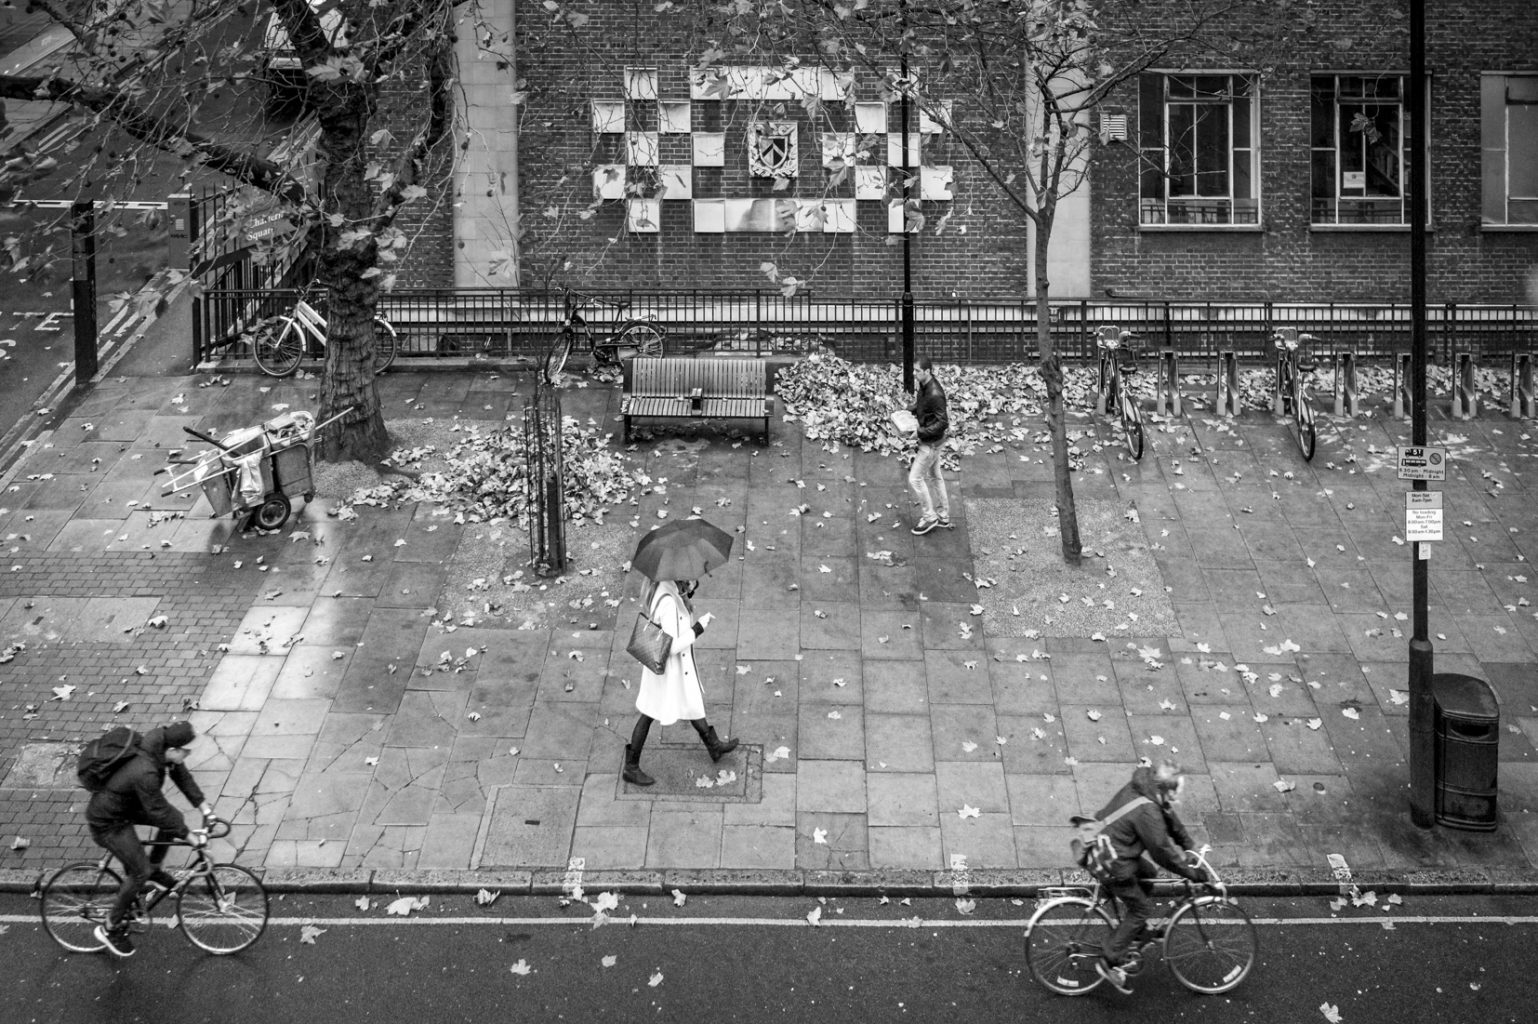 Herbstmorgen, Clerkenwell, London 20. November 2012